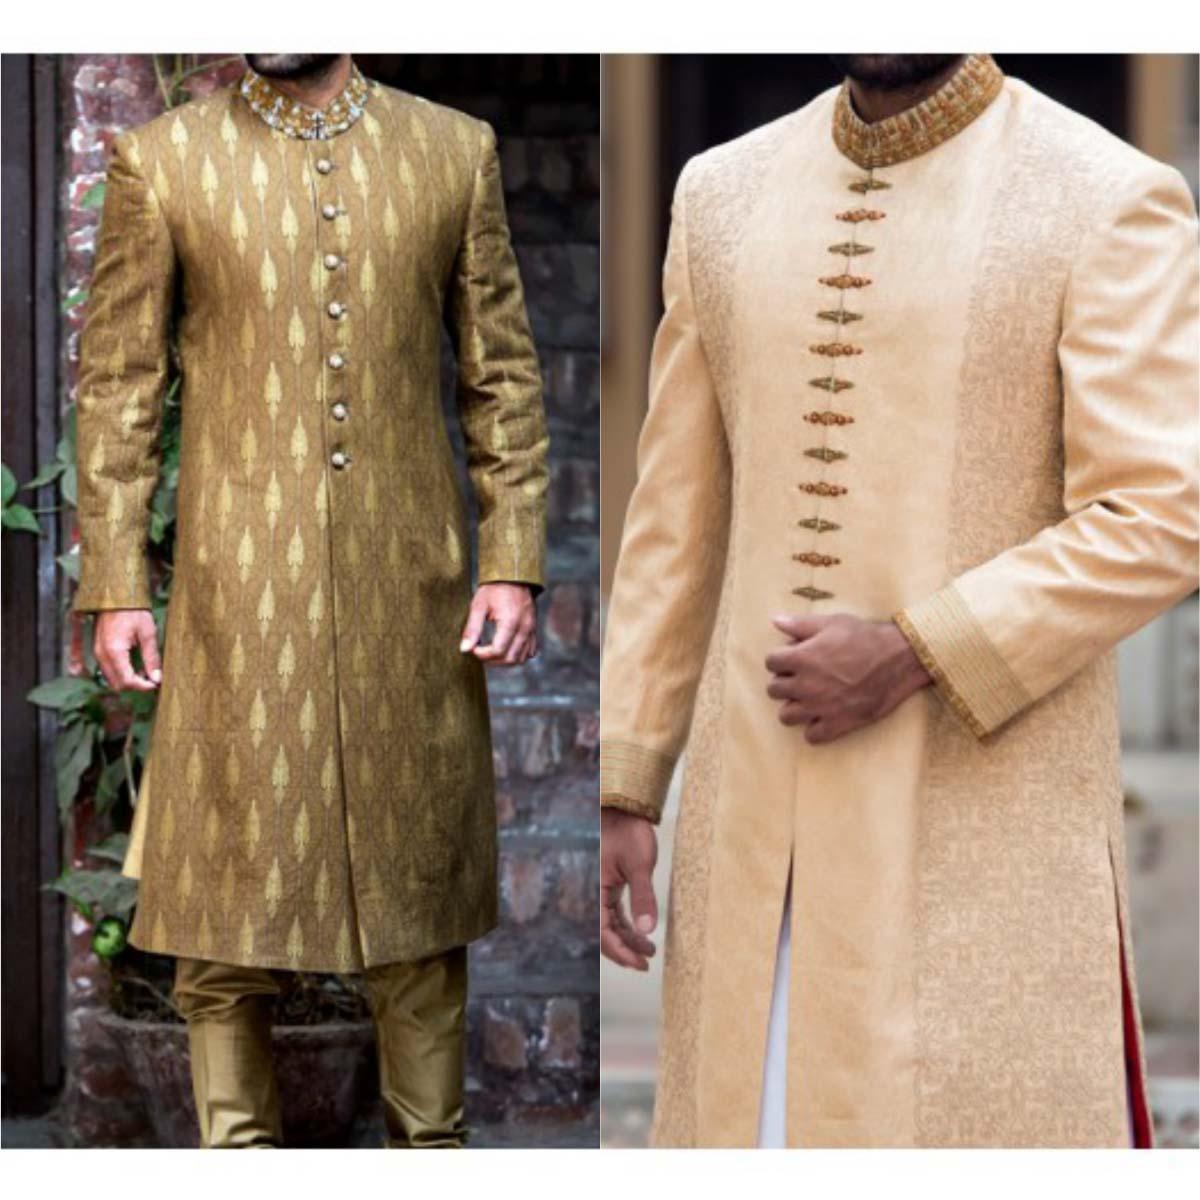 j-j-junaid-jamshed-shwerwanis-design-for-groom-2016